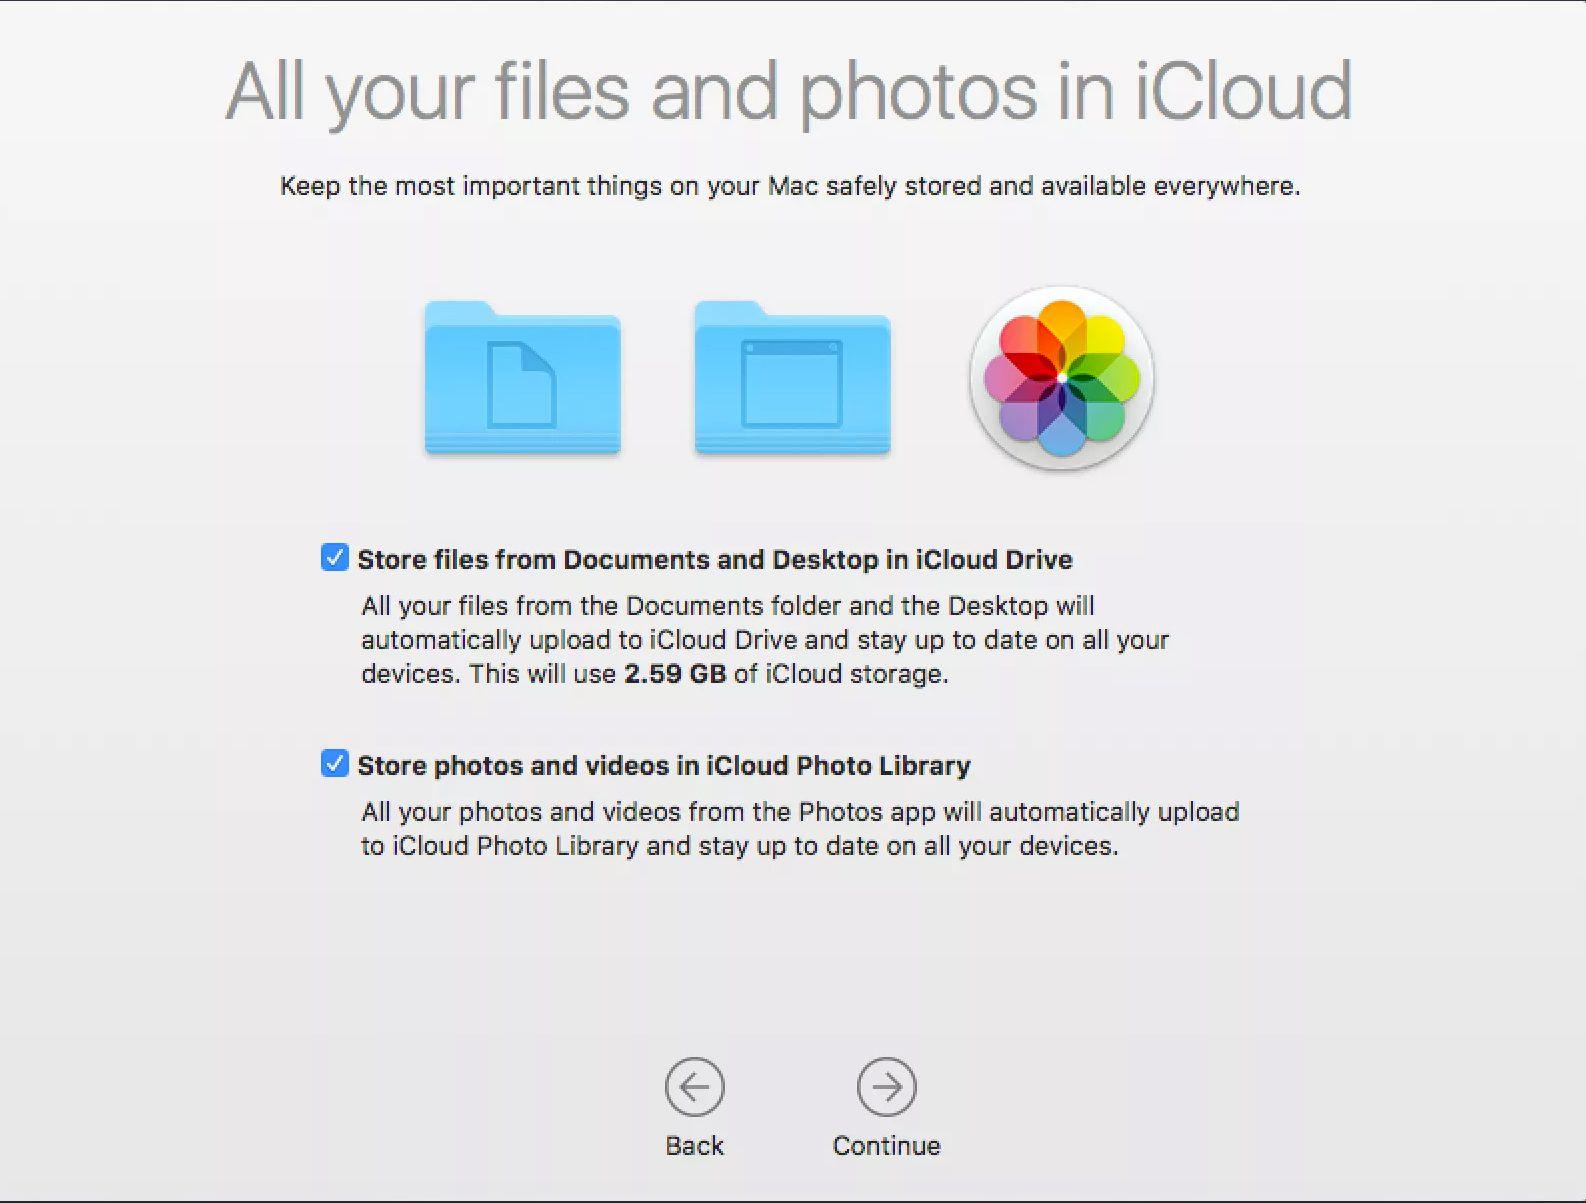 macOS Sierra upgrade installation setup assistant